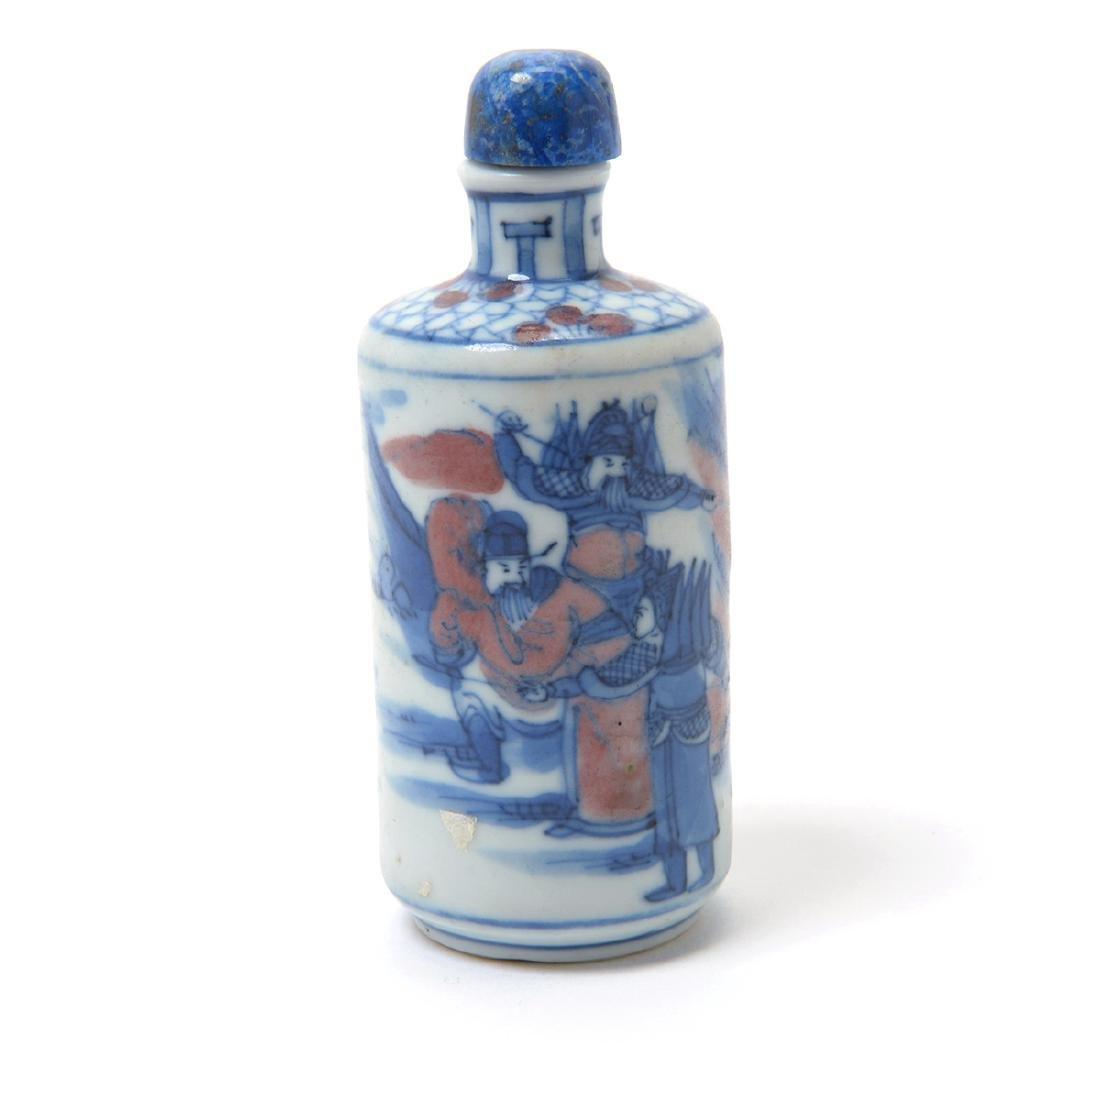 Three Underglaze Blue Porcelain Snuff Bottles, 19th C - 5